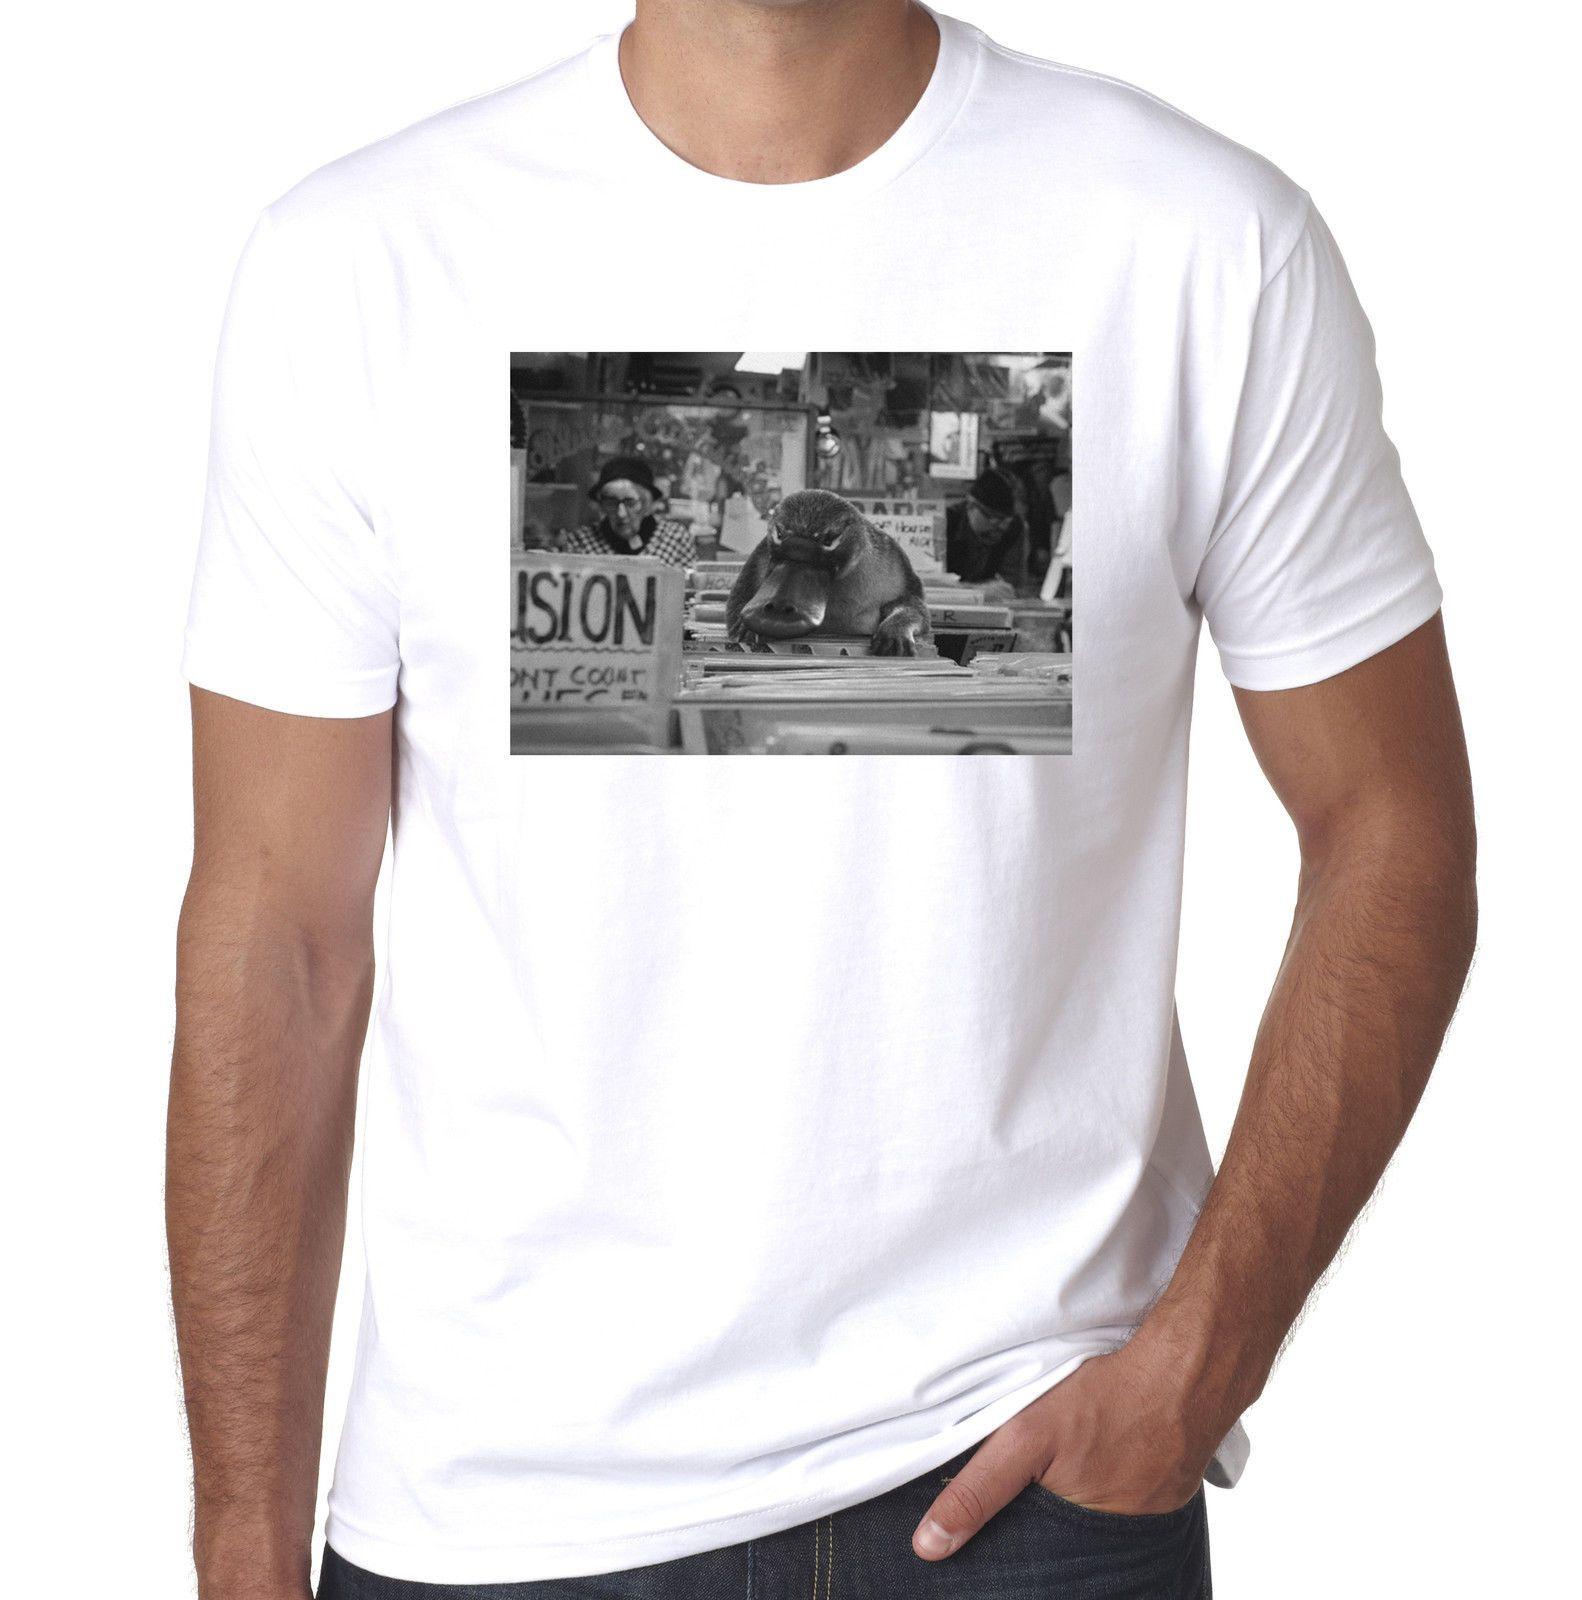 Duck Billed Platypus in record shop djing technics funny mens printed  tshirt 2018 New Brand Mens T Shirt Cotton Short Sleeve